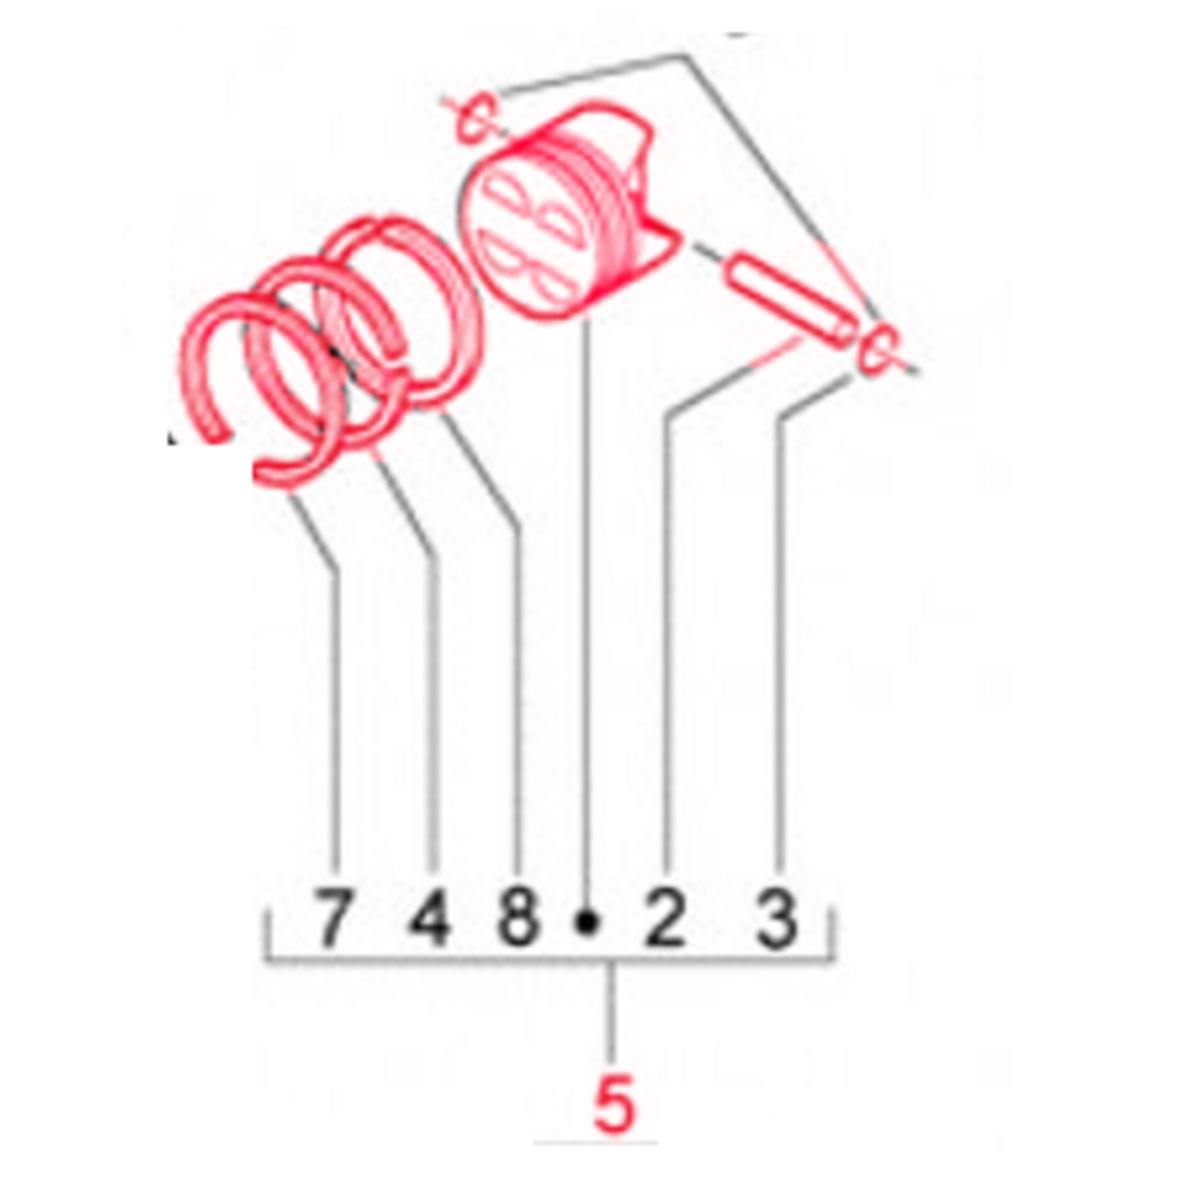 Product image for 'Piston PIAGGIO KAT. 2Title'